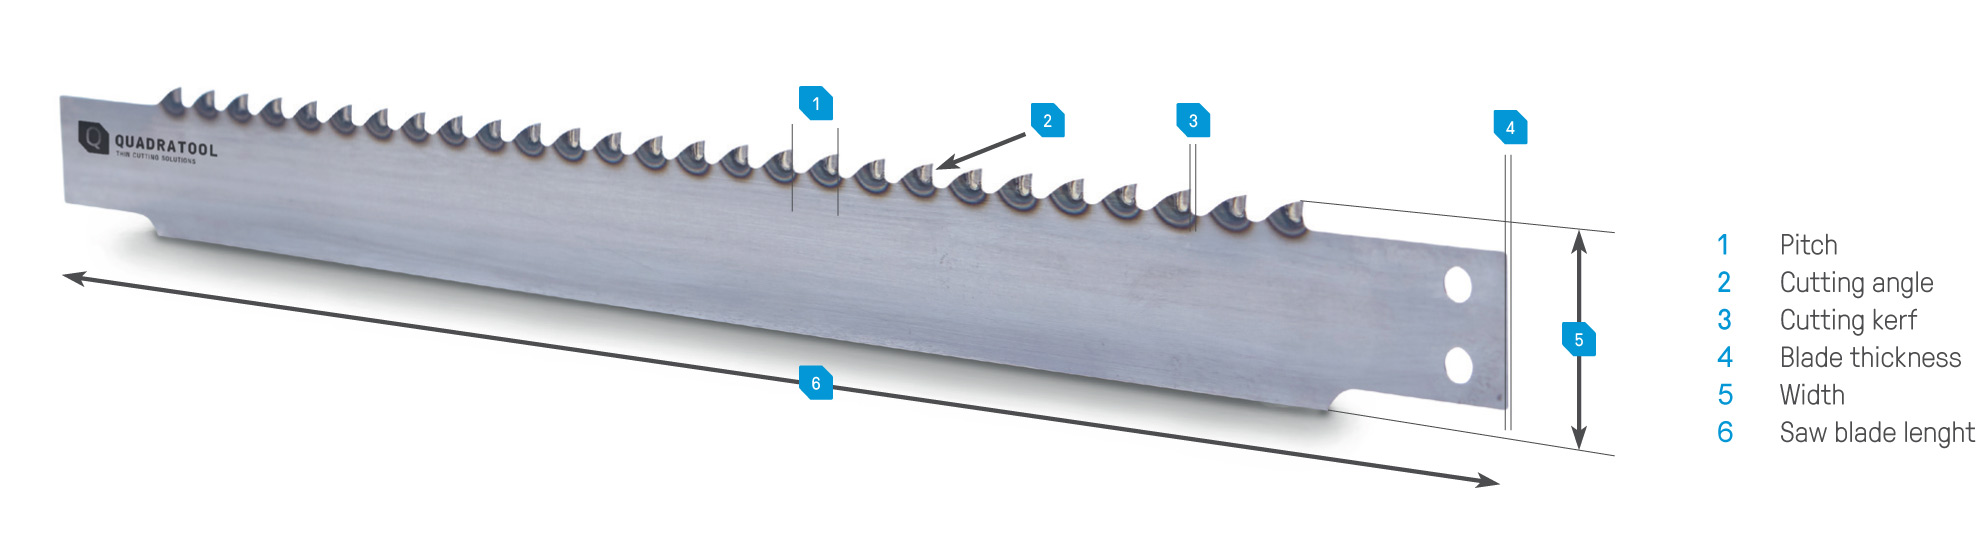 Saw-blade-parameter